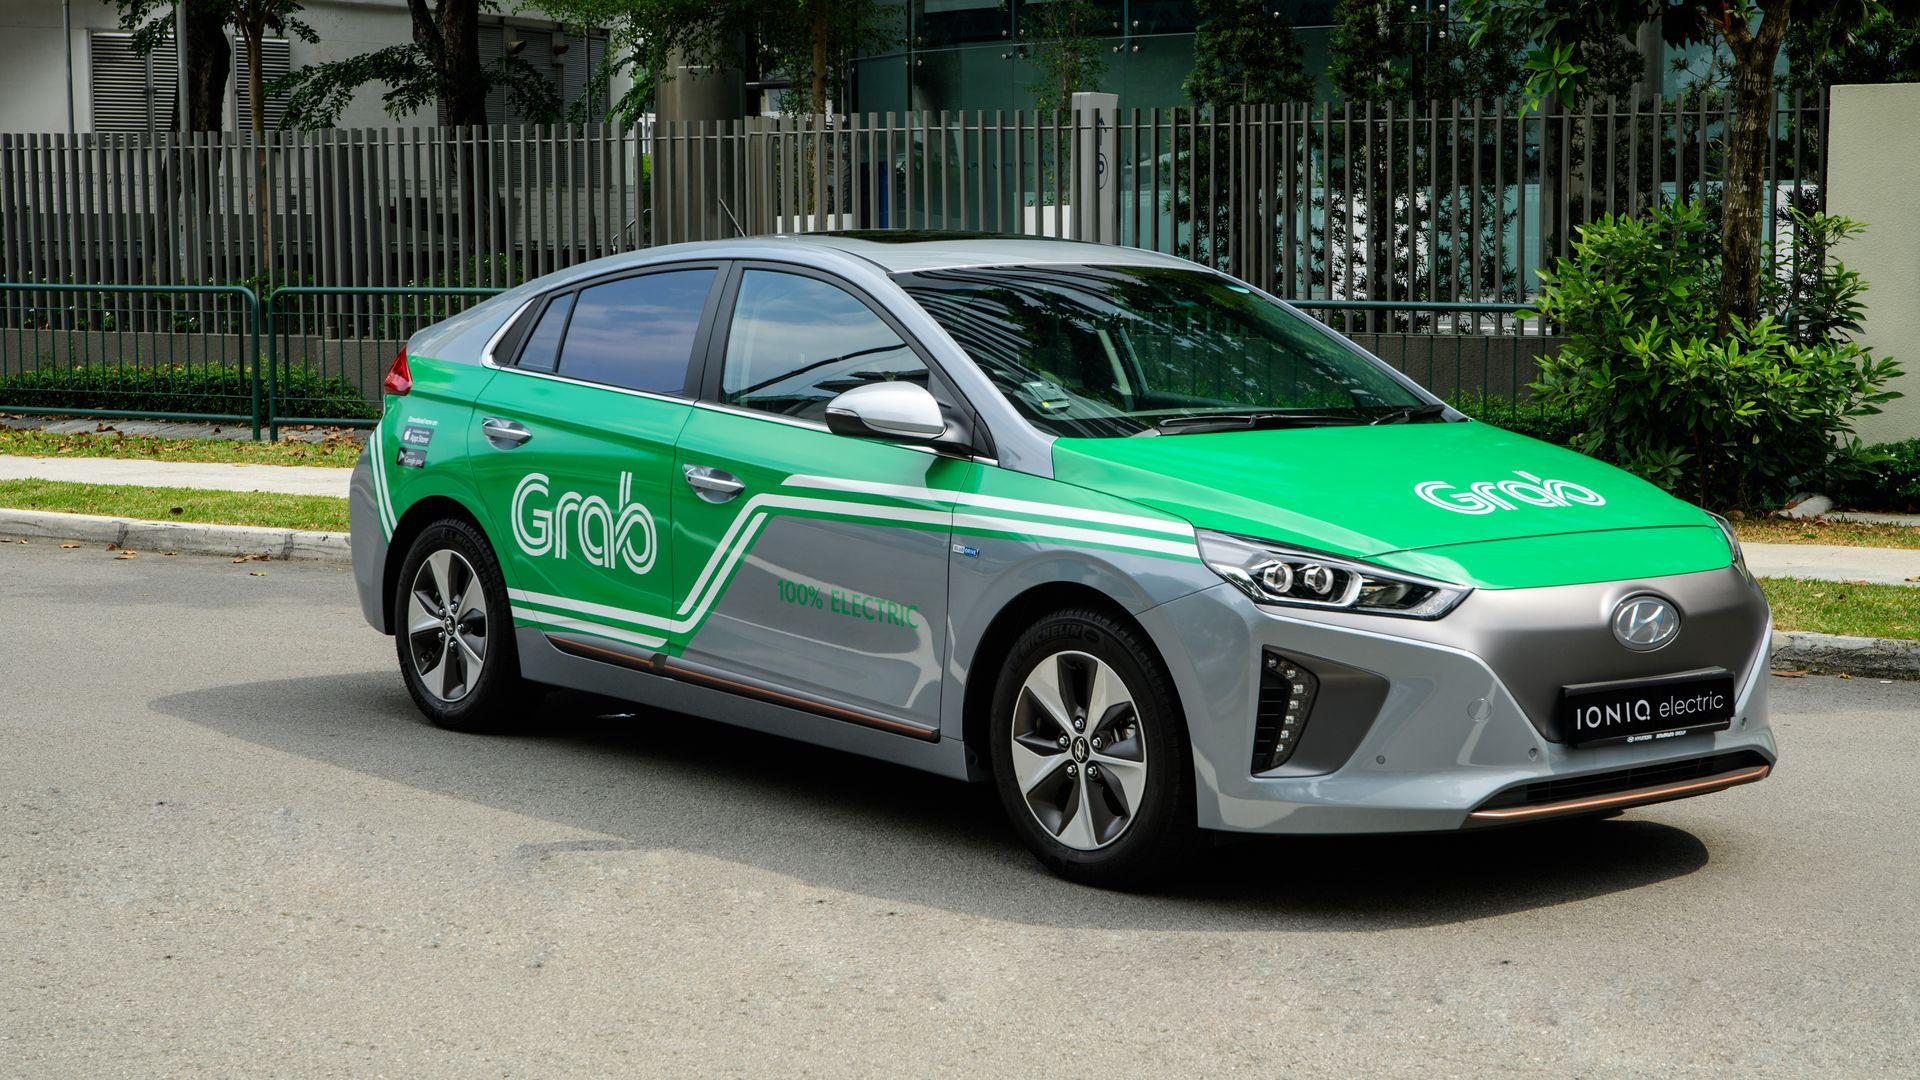 Photo of electric Hyundai car with Grab logo.